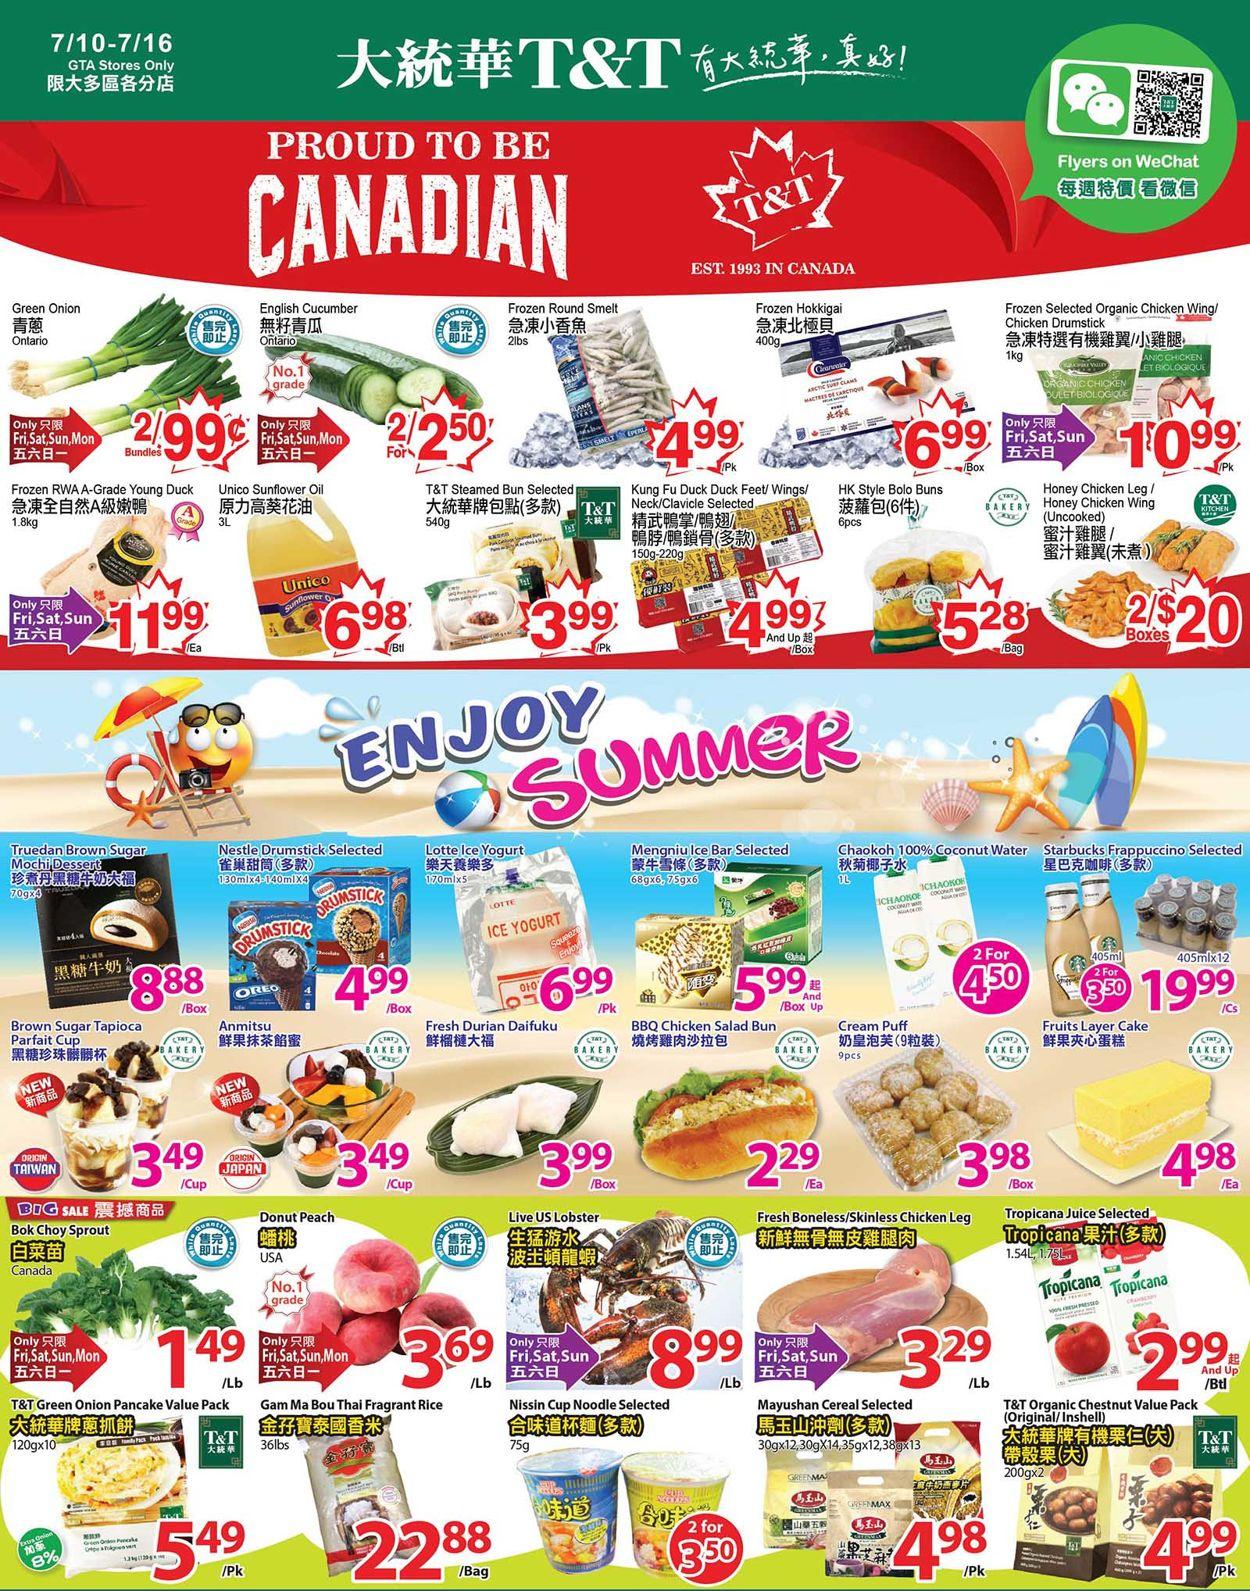 T&T Supermarket Flyer - 07/10-07/16/2020